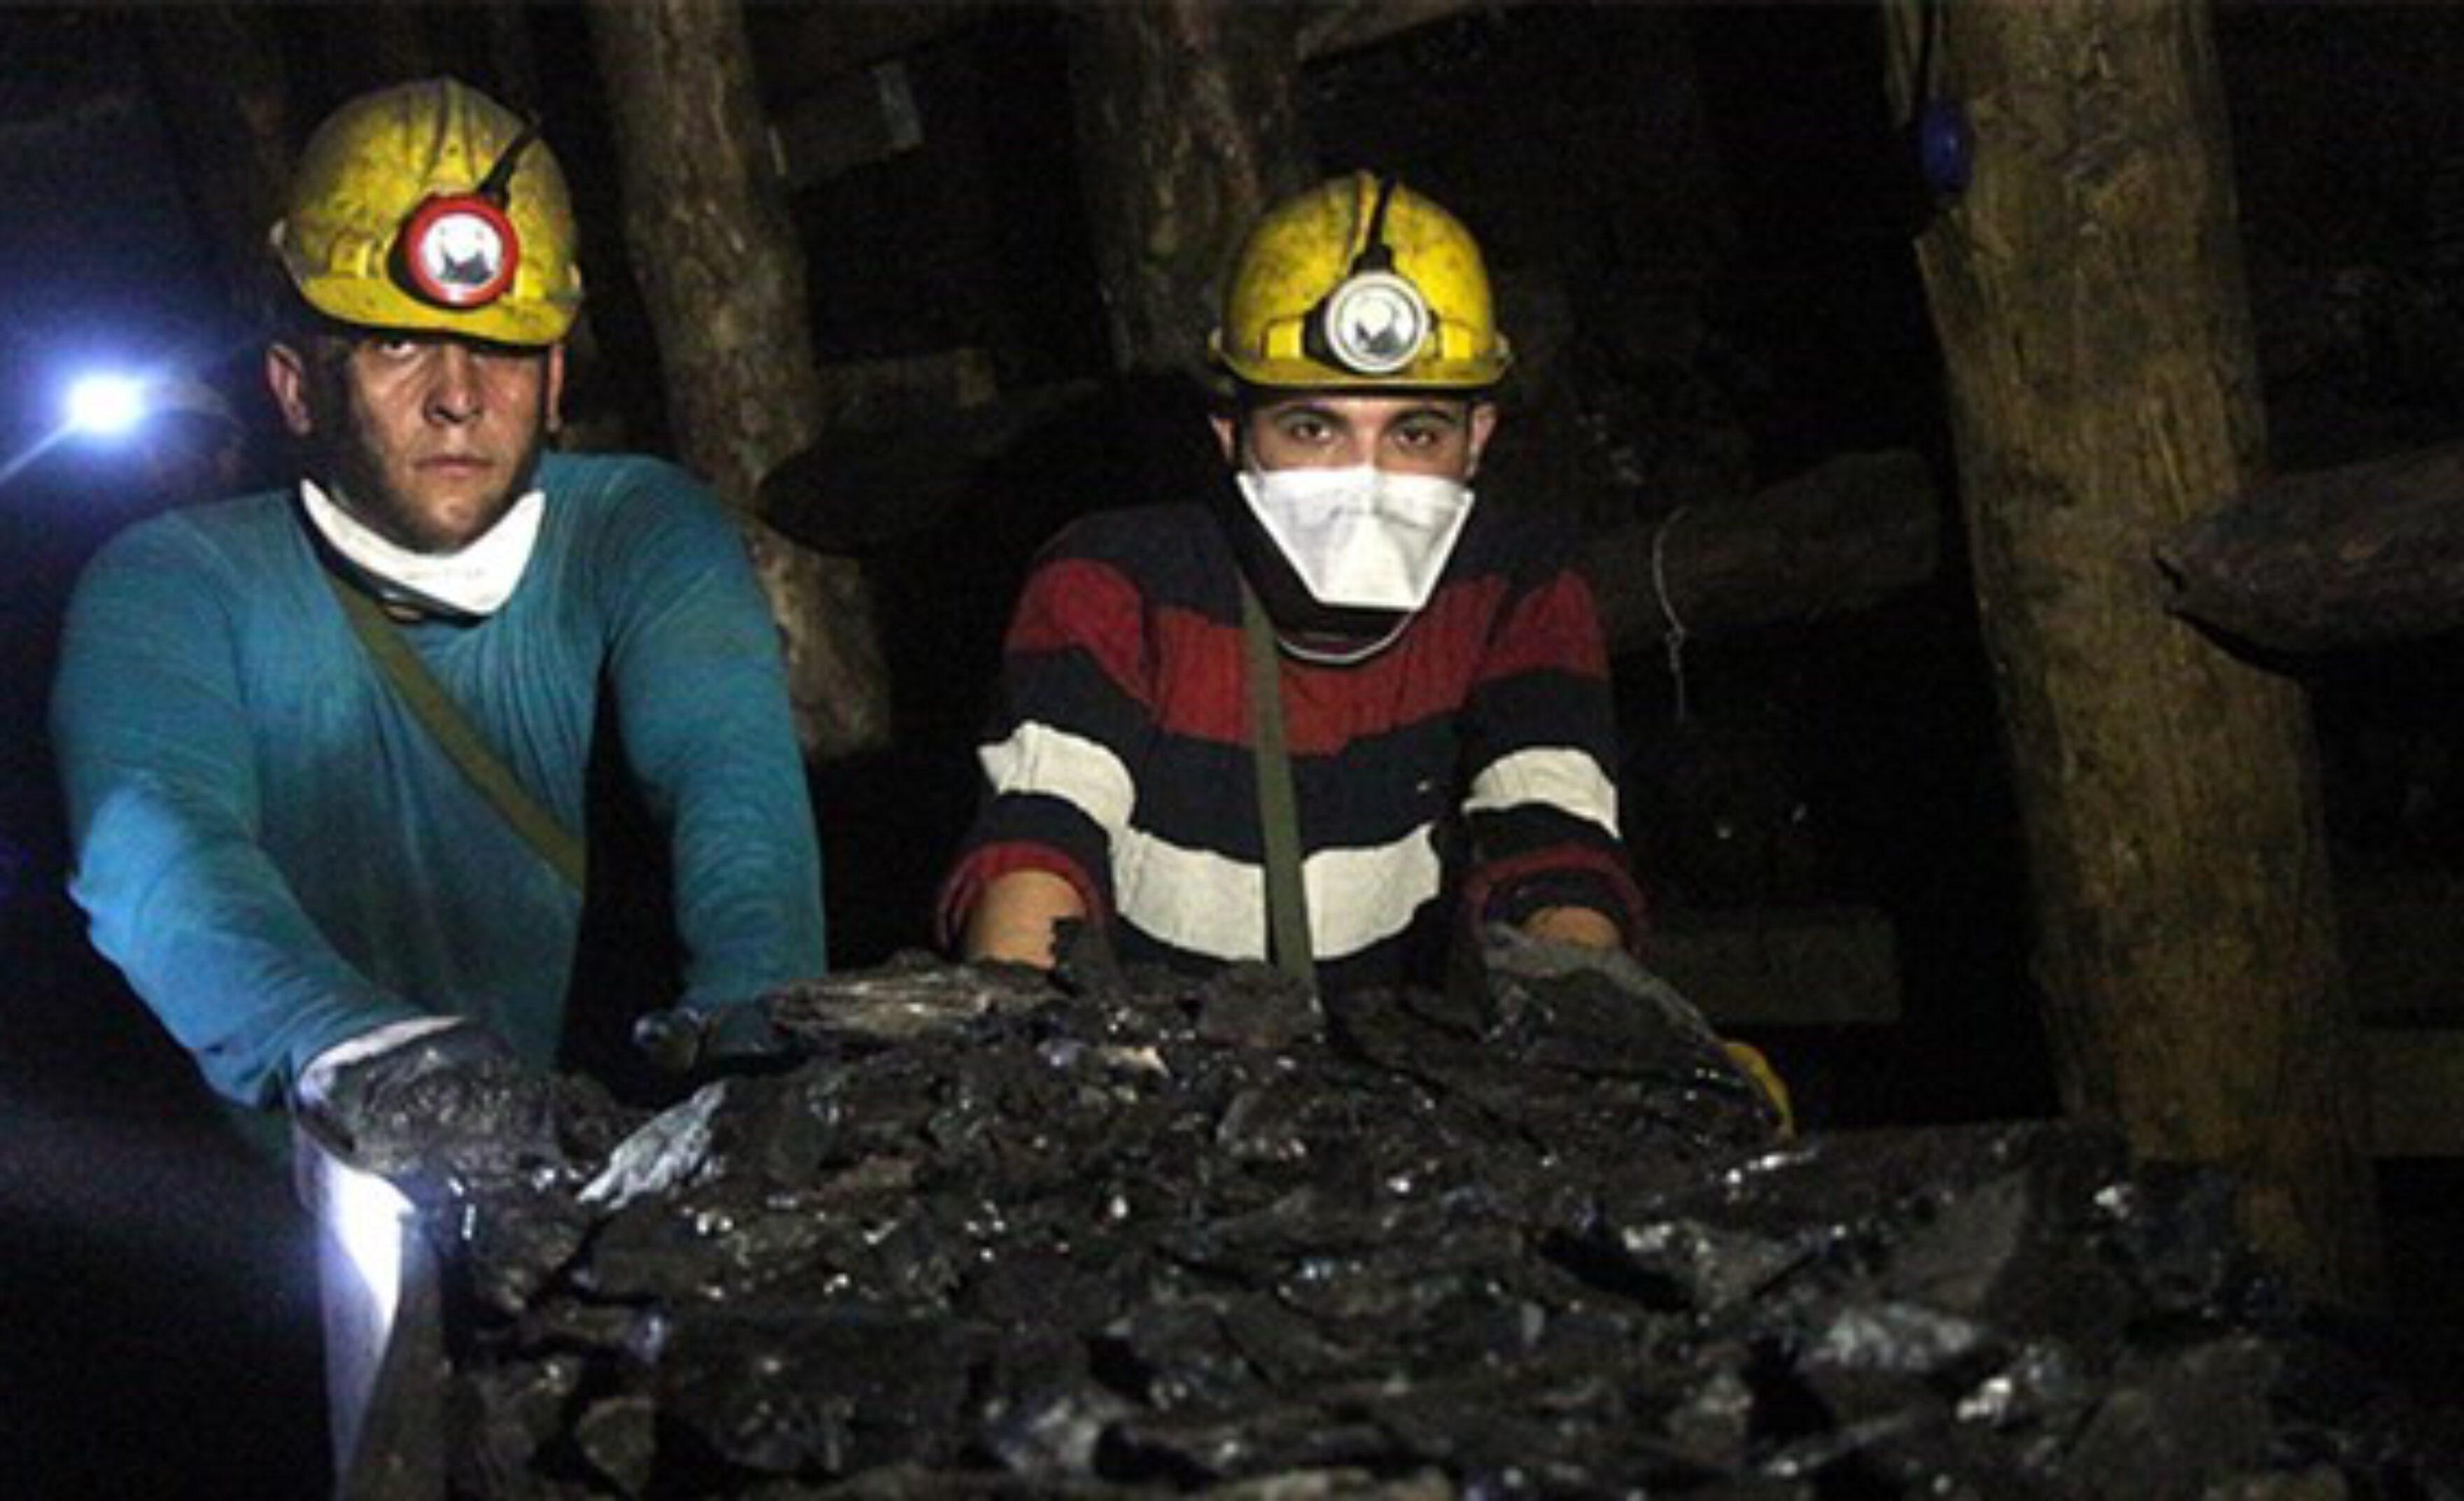 Madenlerde Tozla Mücadele